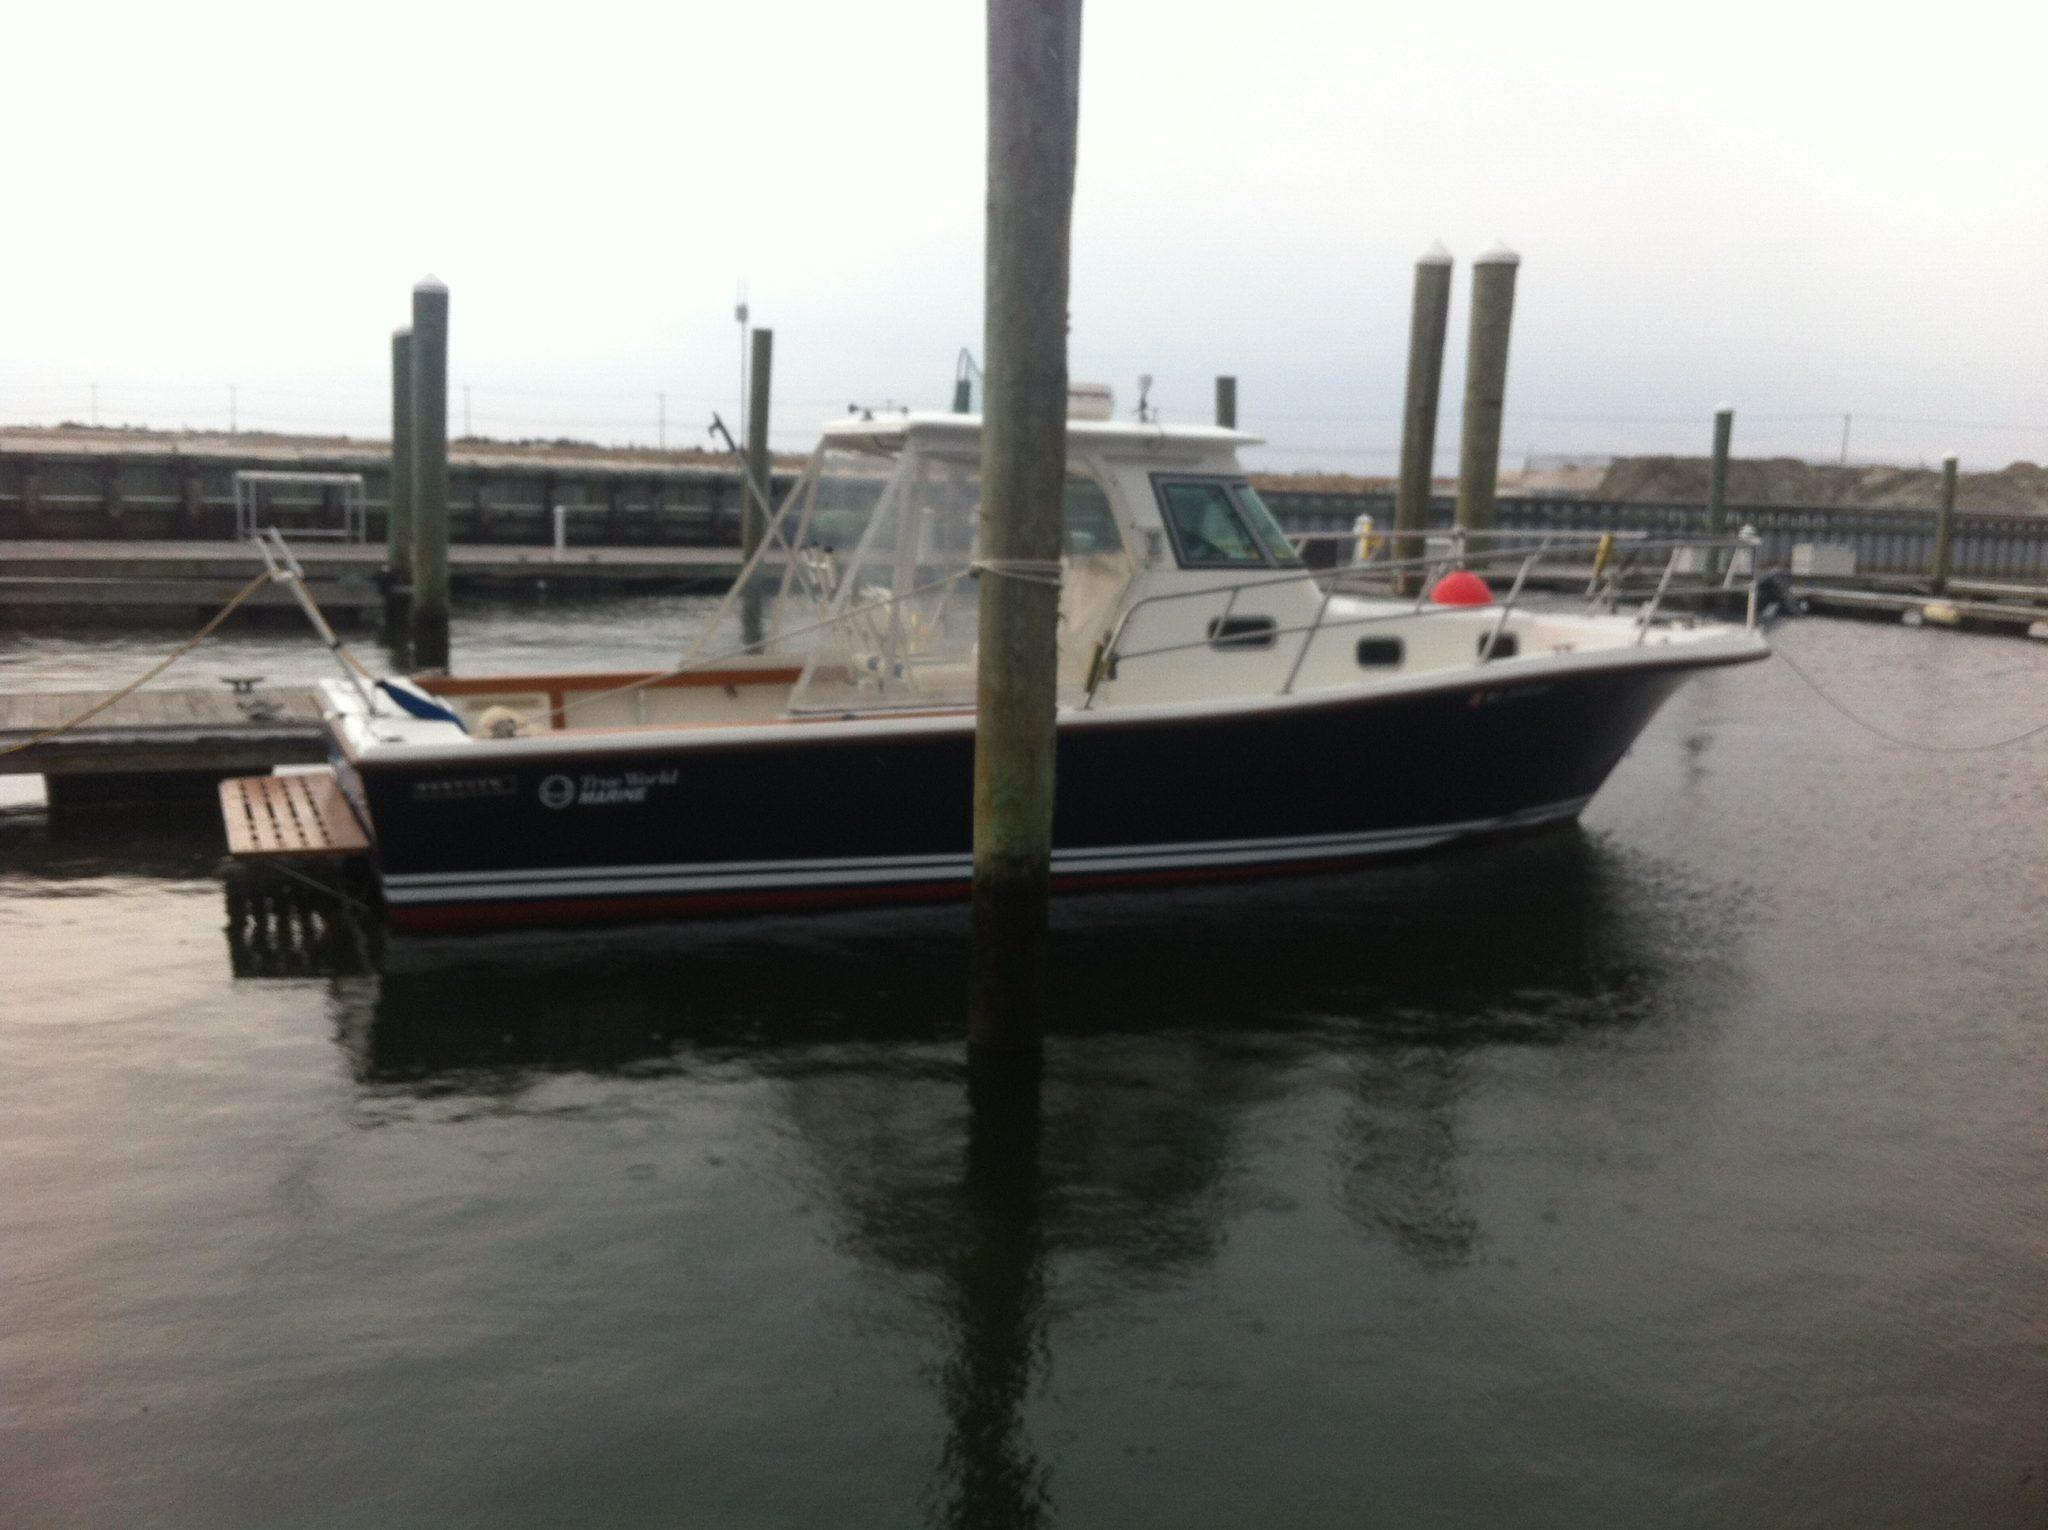 The Boat Docked Ocean City